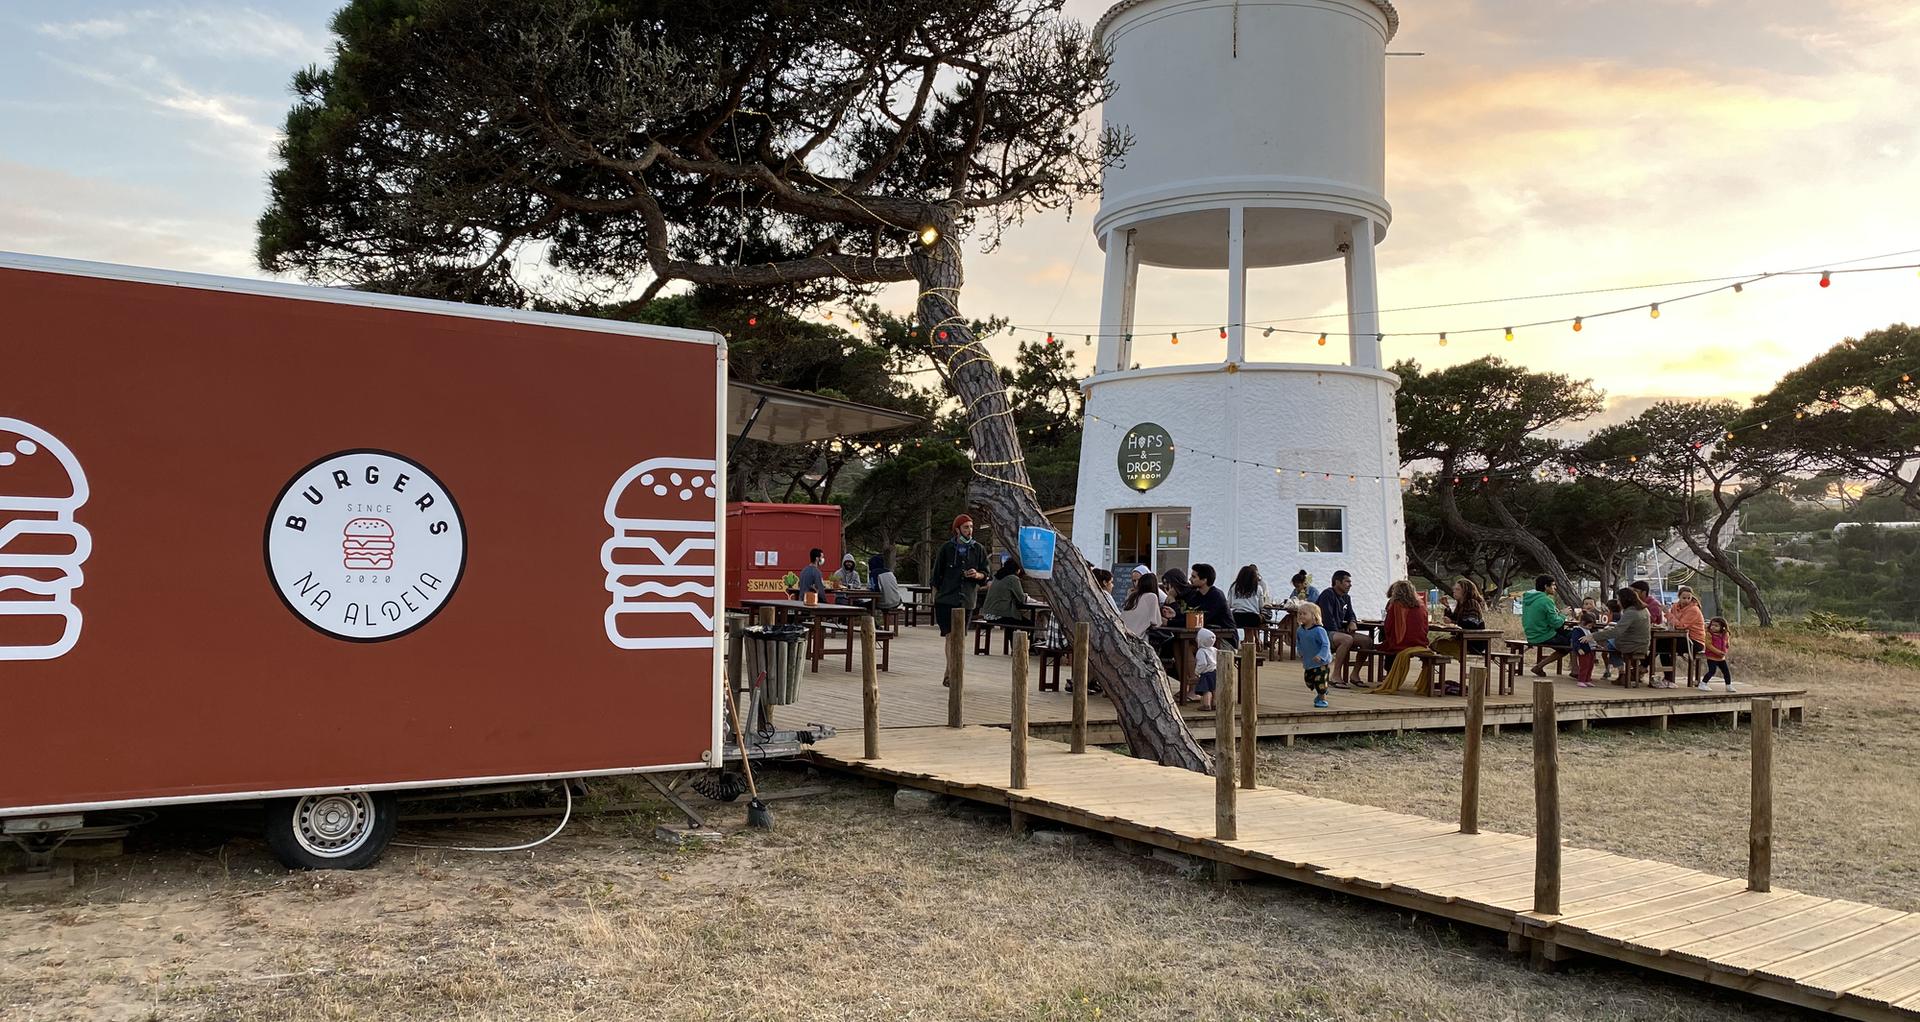 Burgers na Aldeia